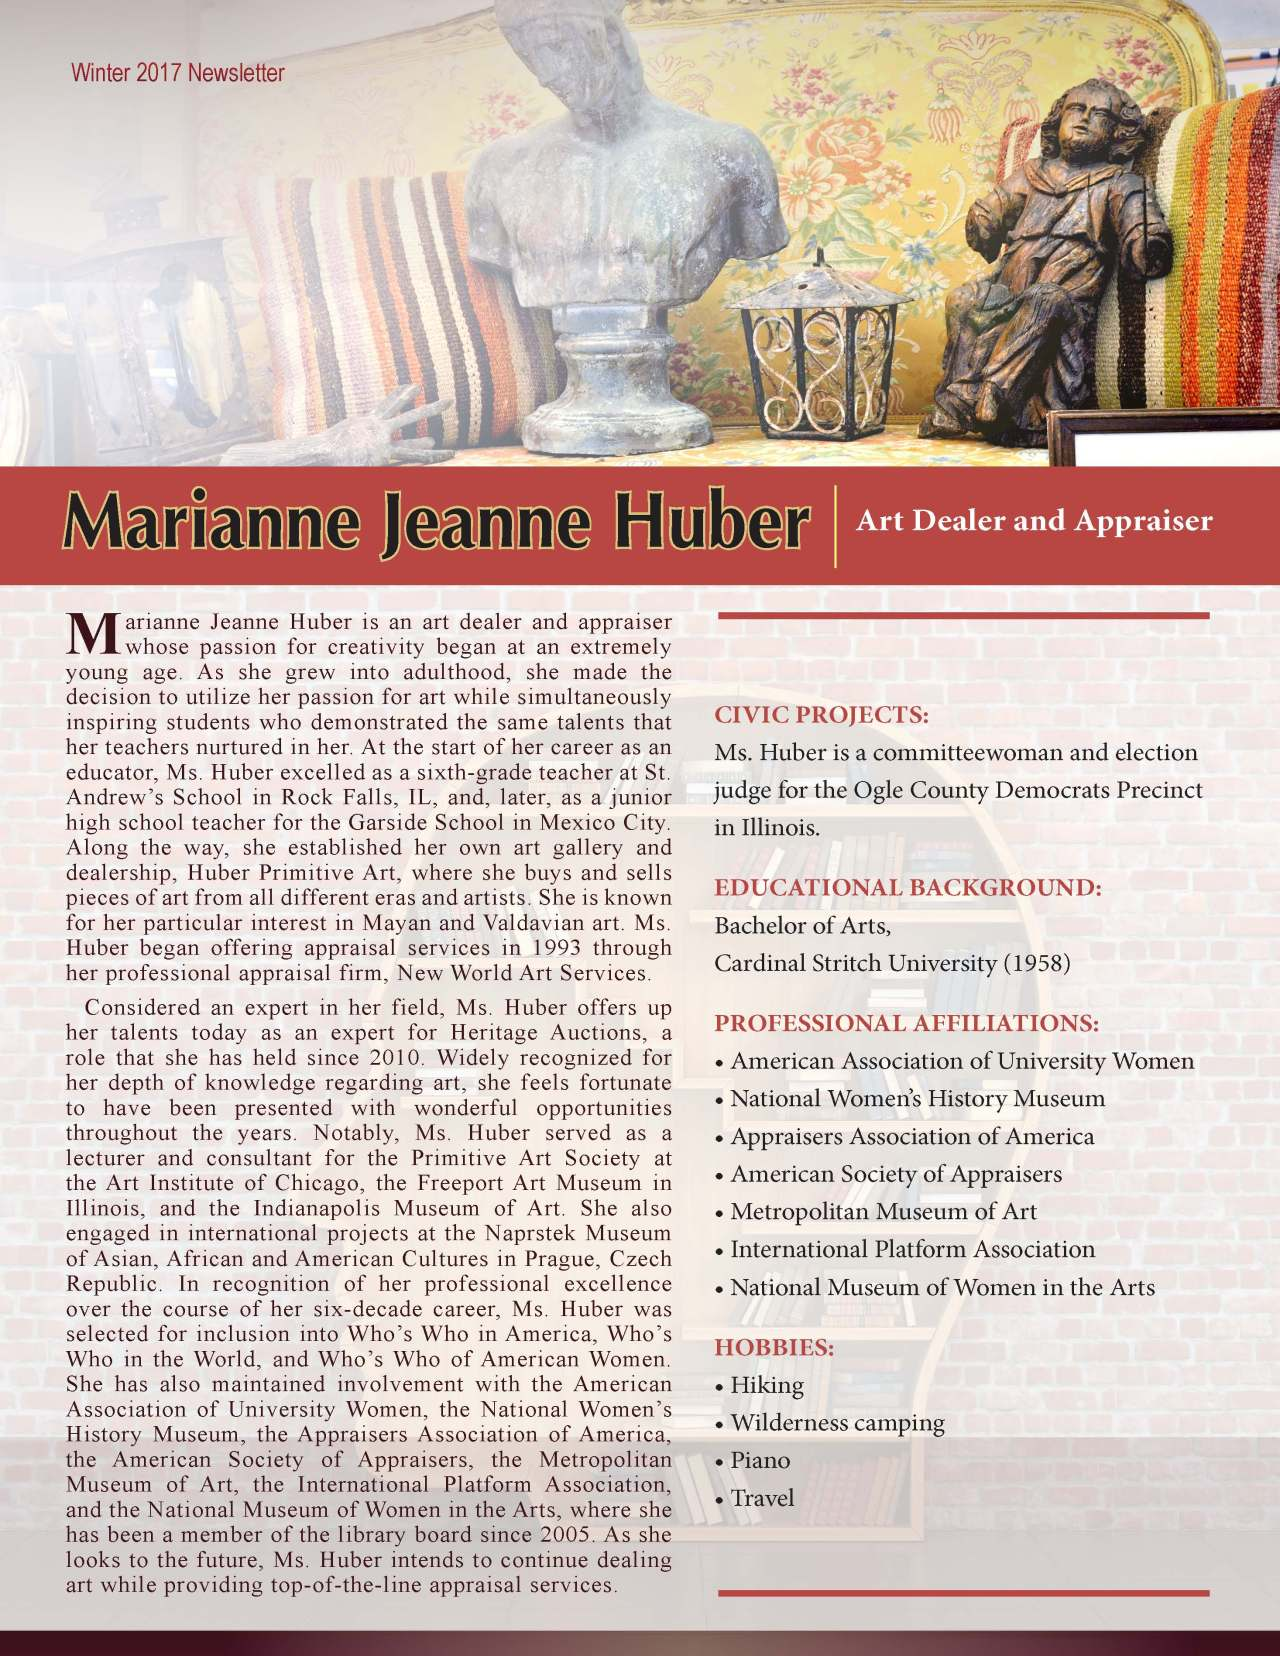 Huber, Marianne